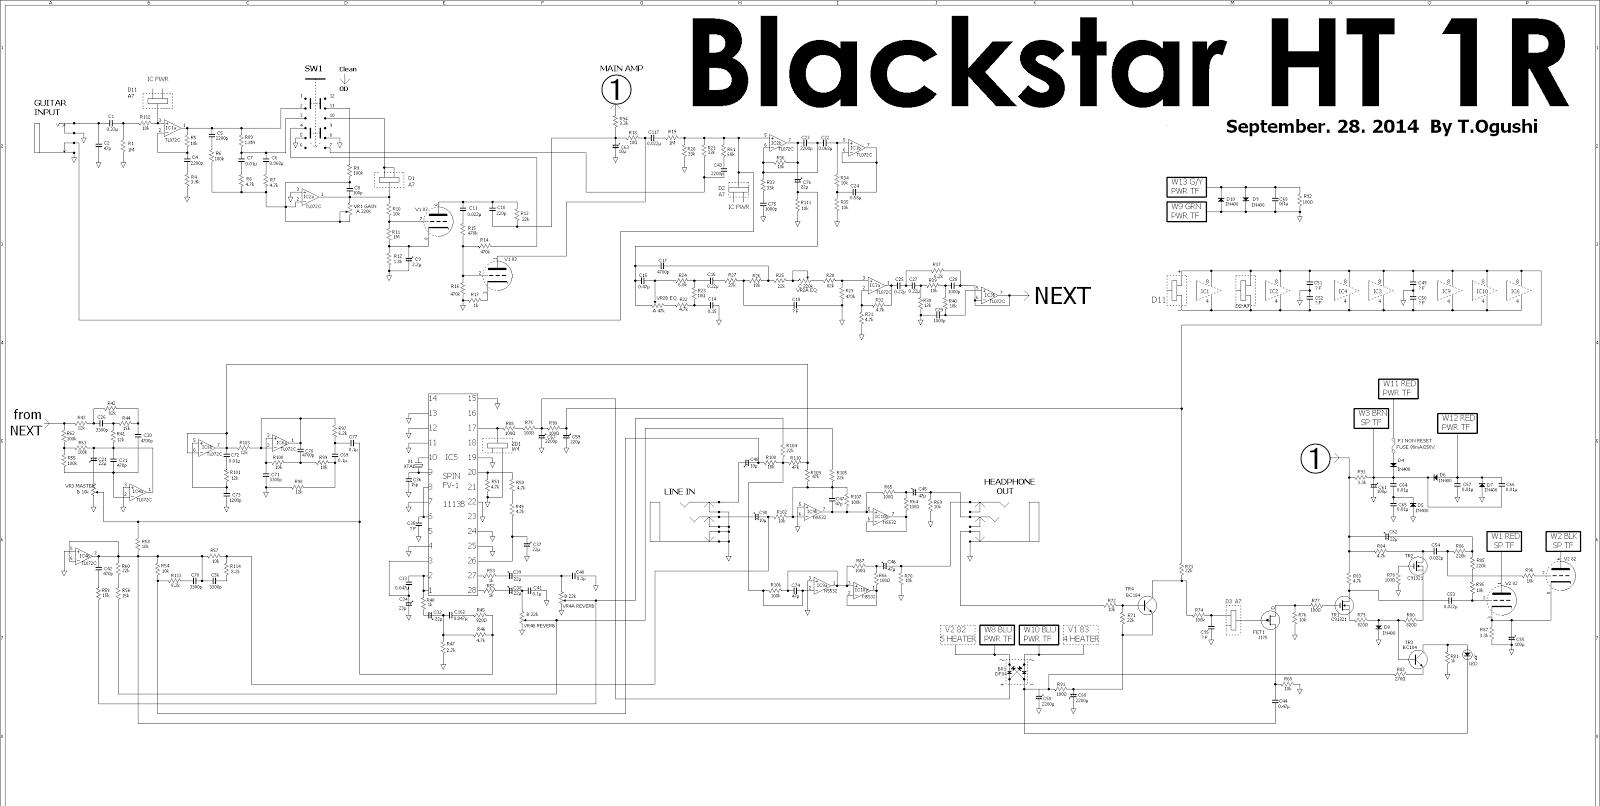 hight resolution of ht wiring diagram a96 btbw eastside it u2022 turbo 350 transmission rebuild diagram diagram h t